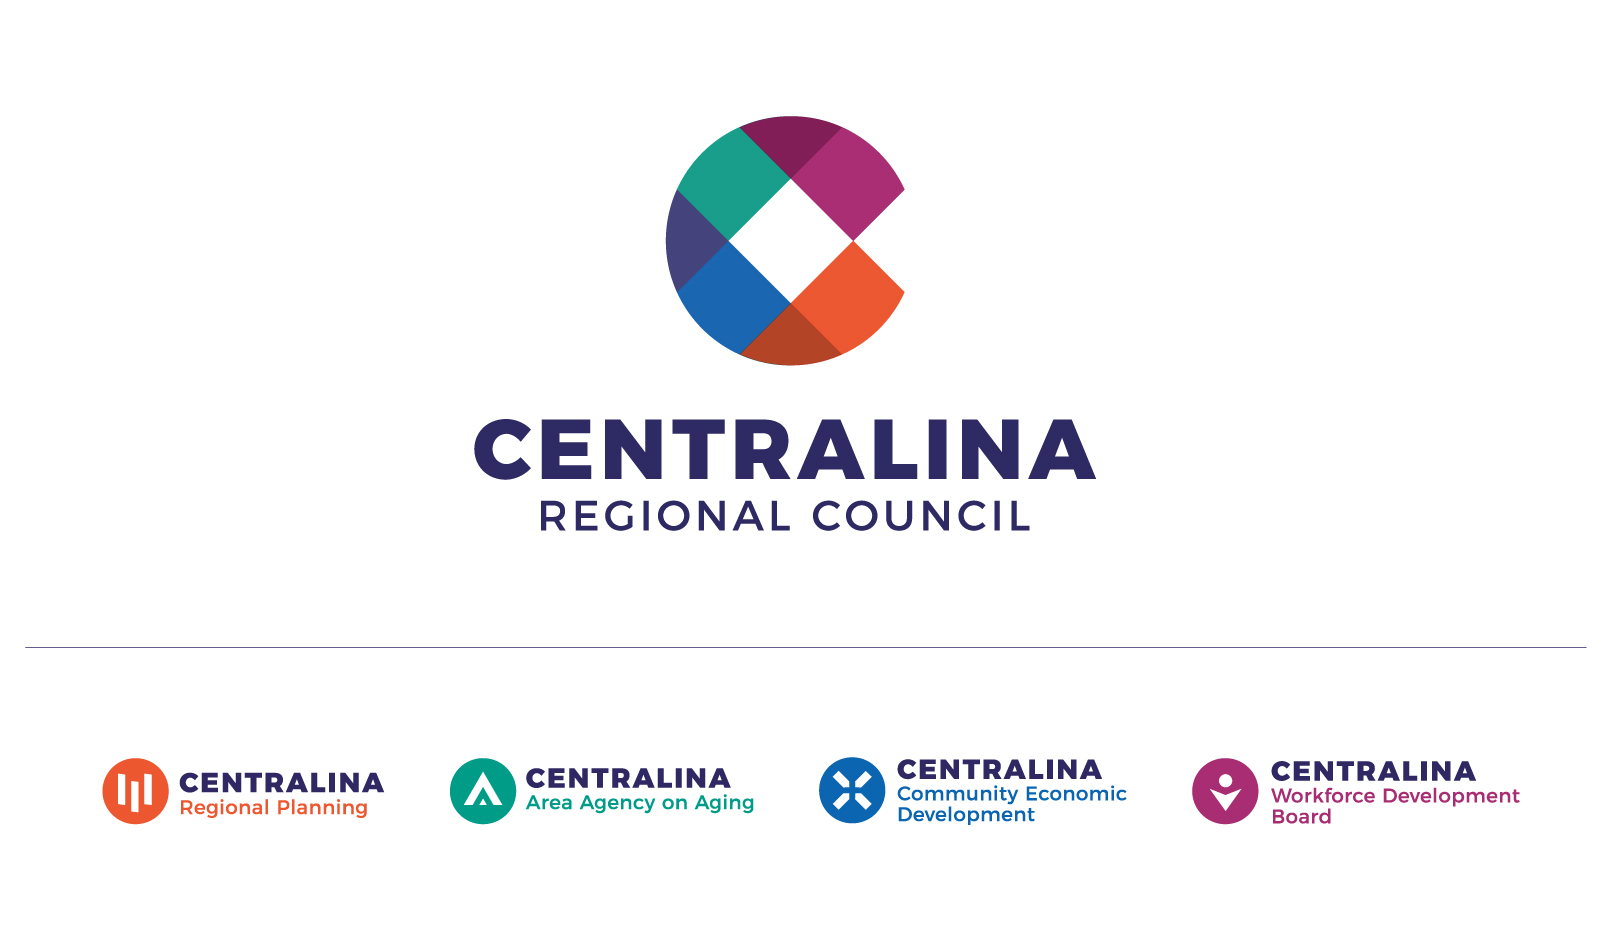 Centralina Regional Council Logos